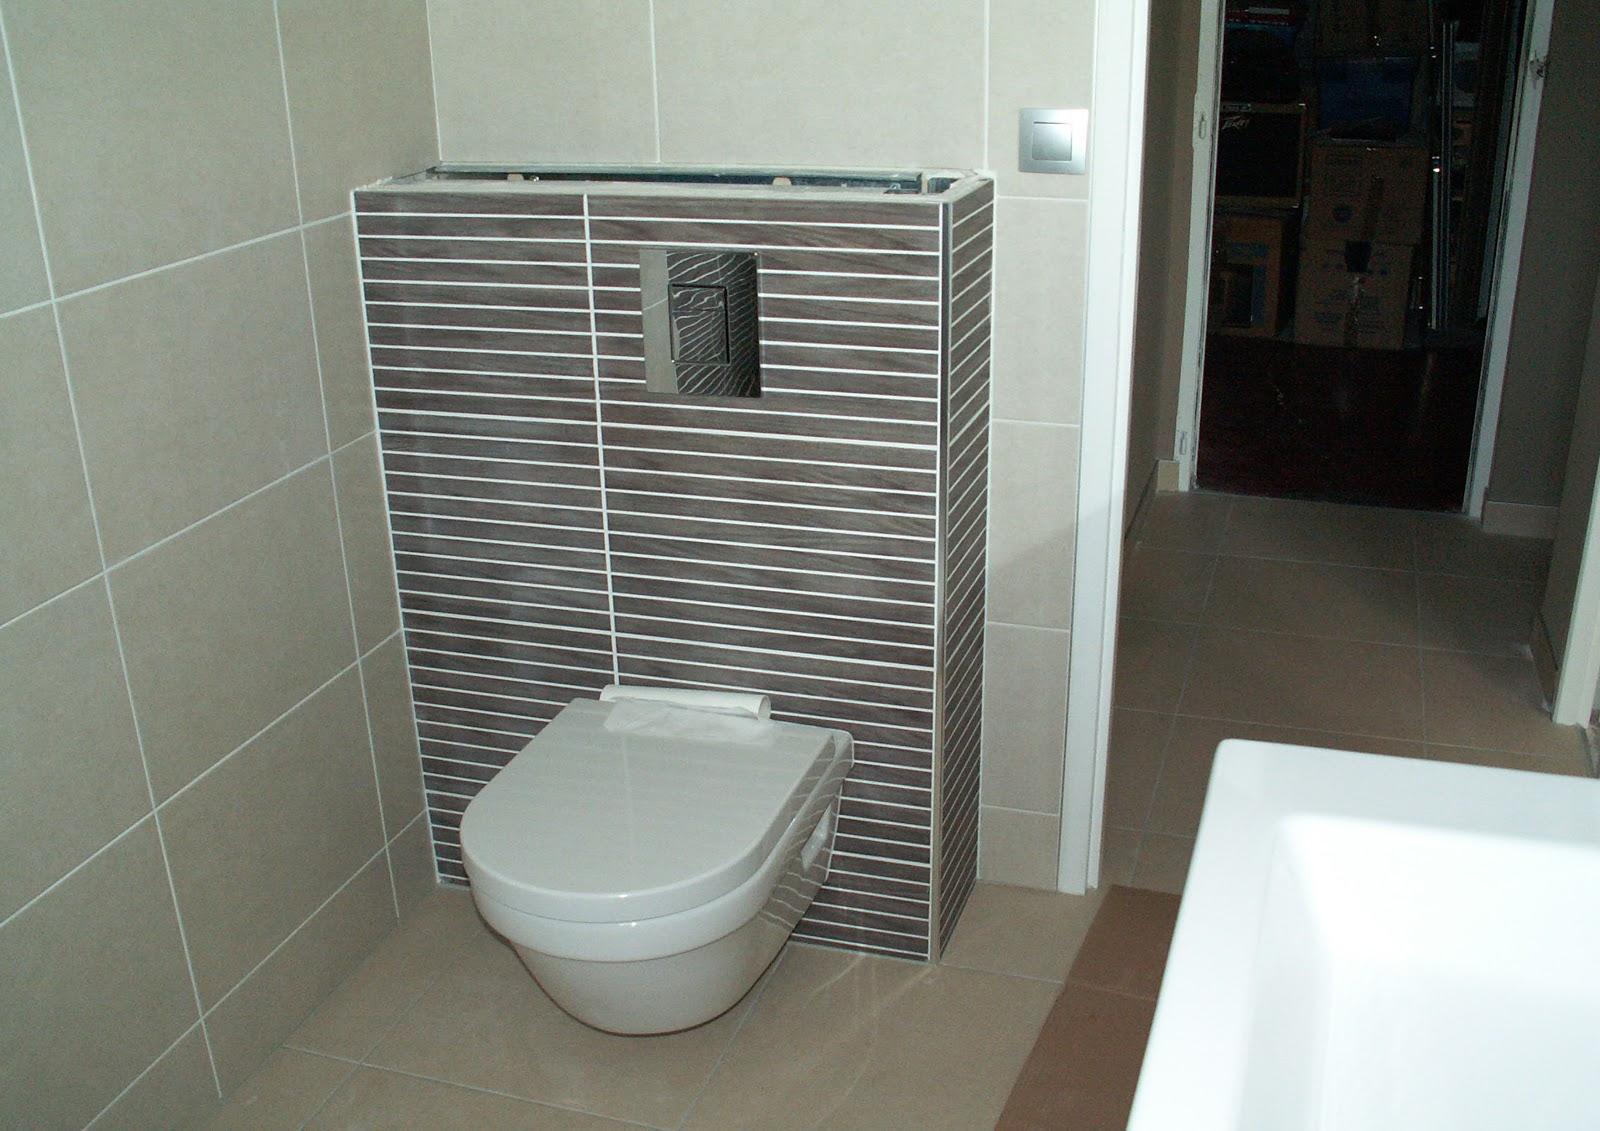 Carrelage salle de bain aubade le carrelage douche sous for Carrelage aubade